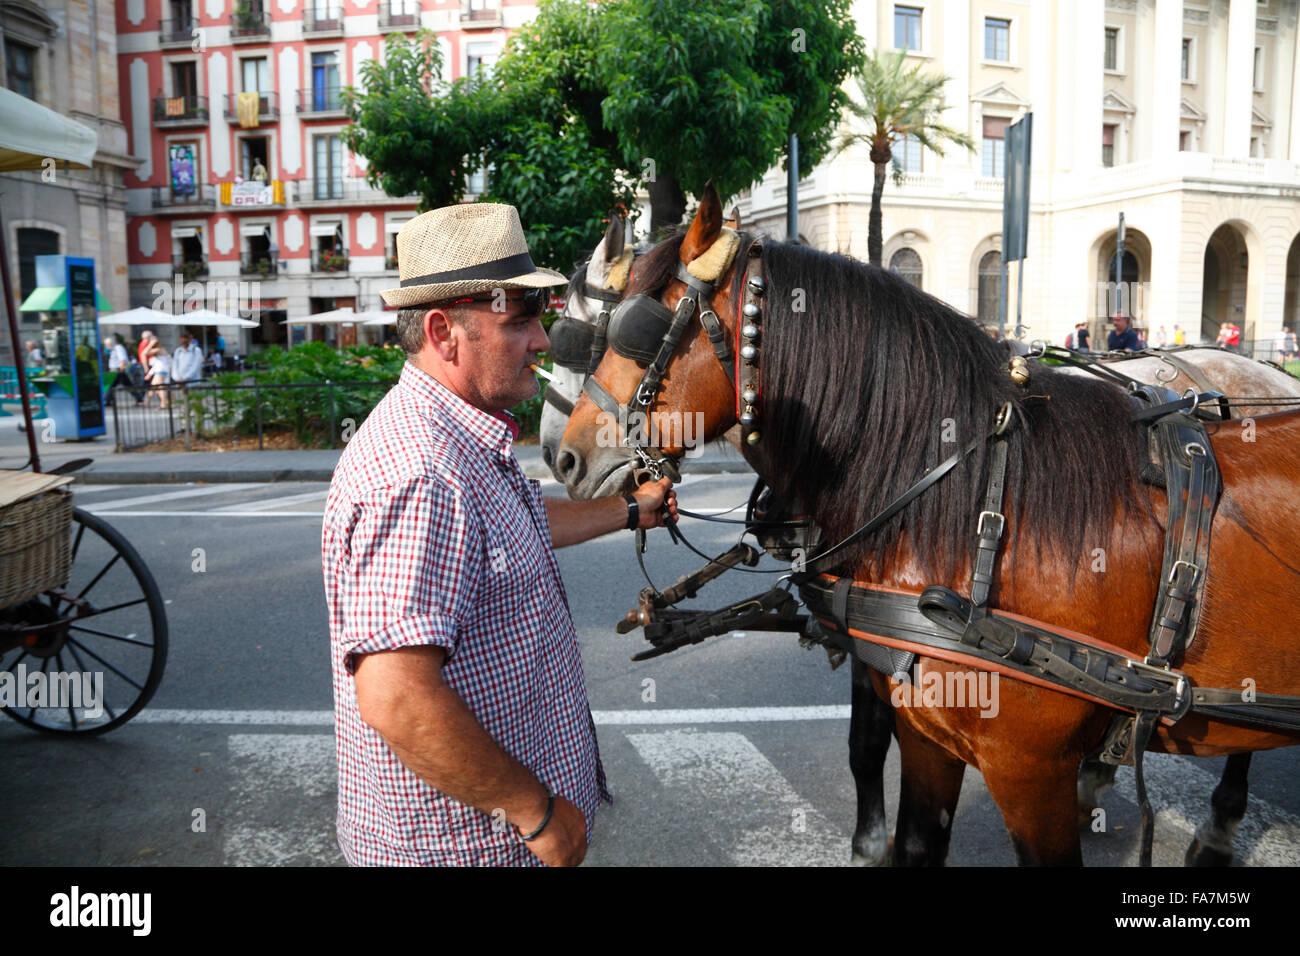 Carriage at Ramblas, Barri Gotic, Barcelona, Spain, Europe - Stock Image